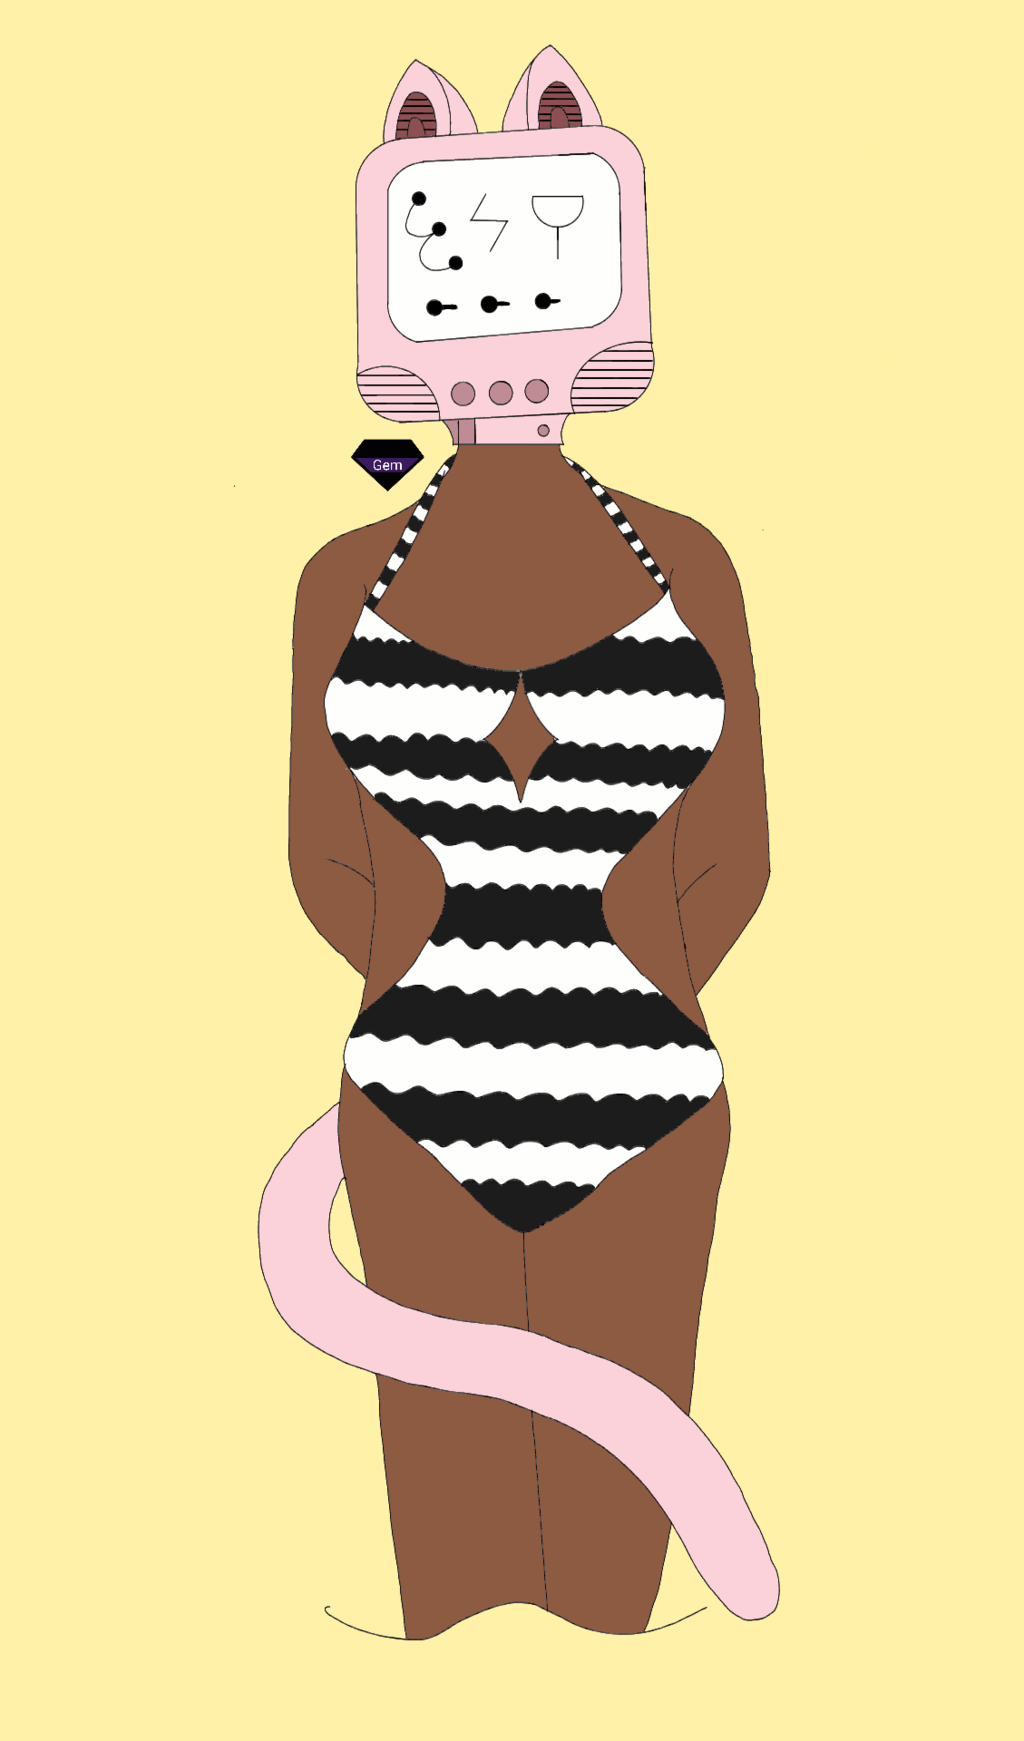 Most recent image: Feline in a monokini